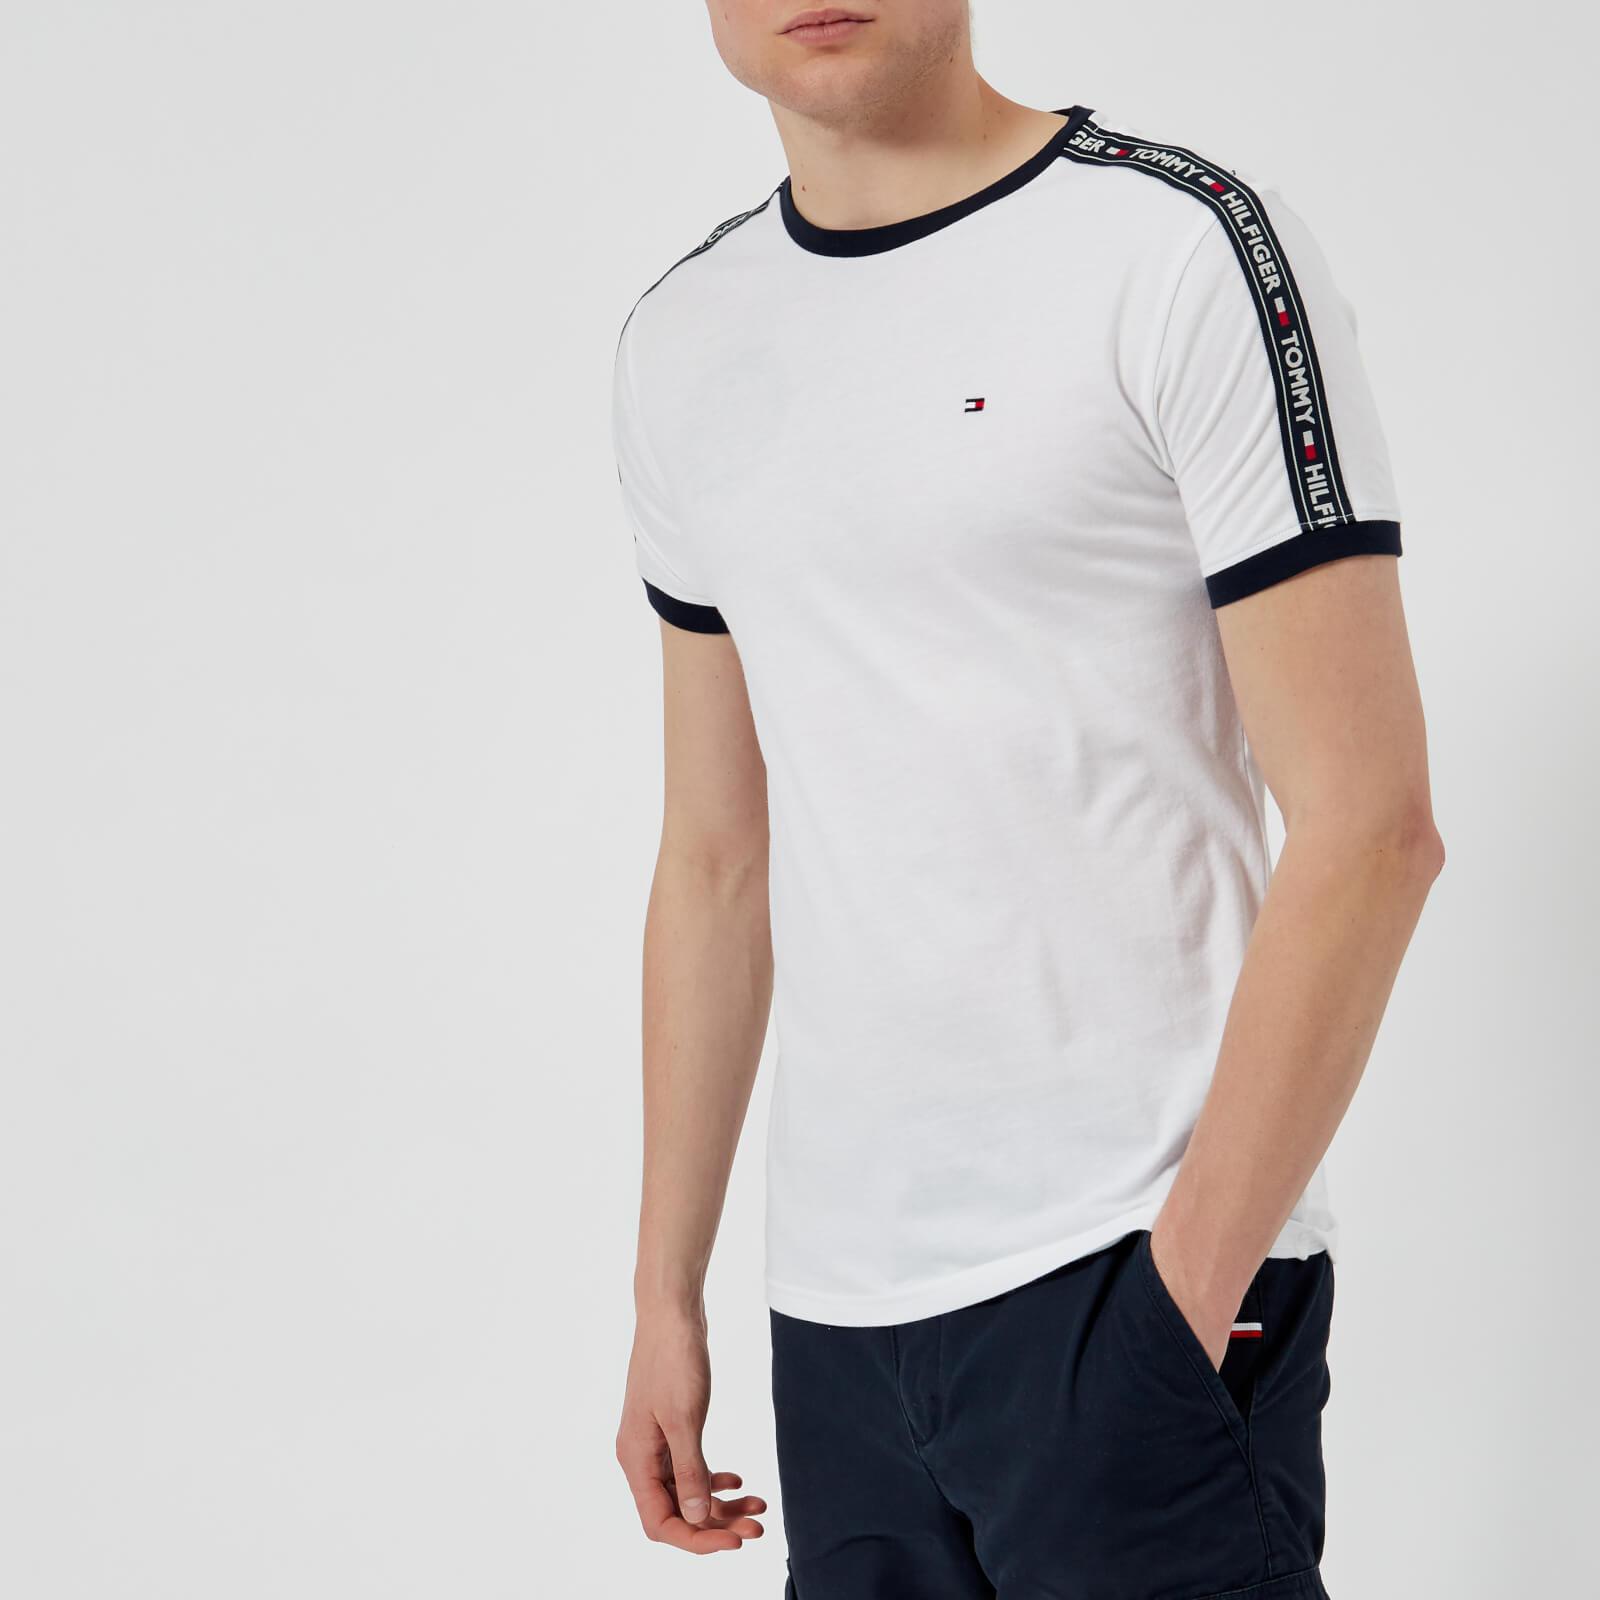 86991ff21 Tommy Hilfiger Men's Tape T-Shirt - White Clothing | TheHut.com